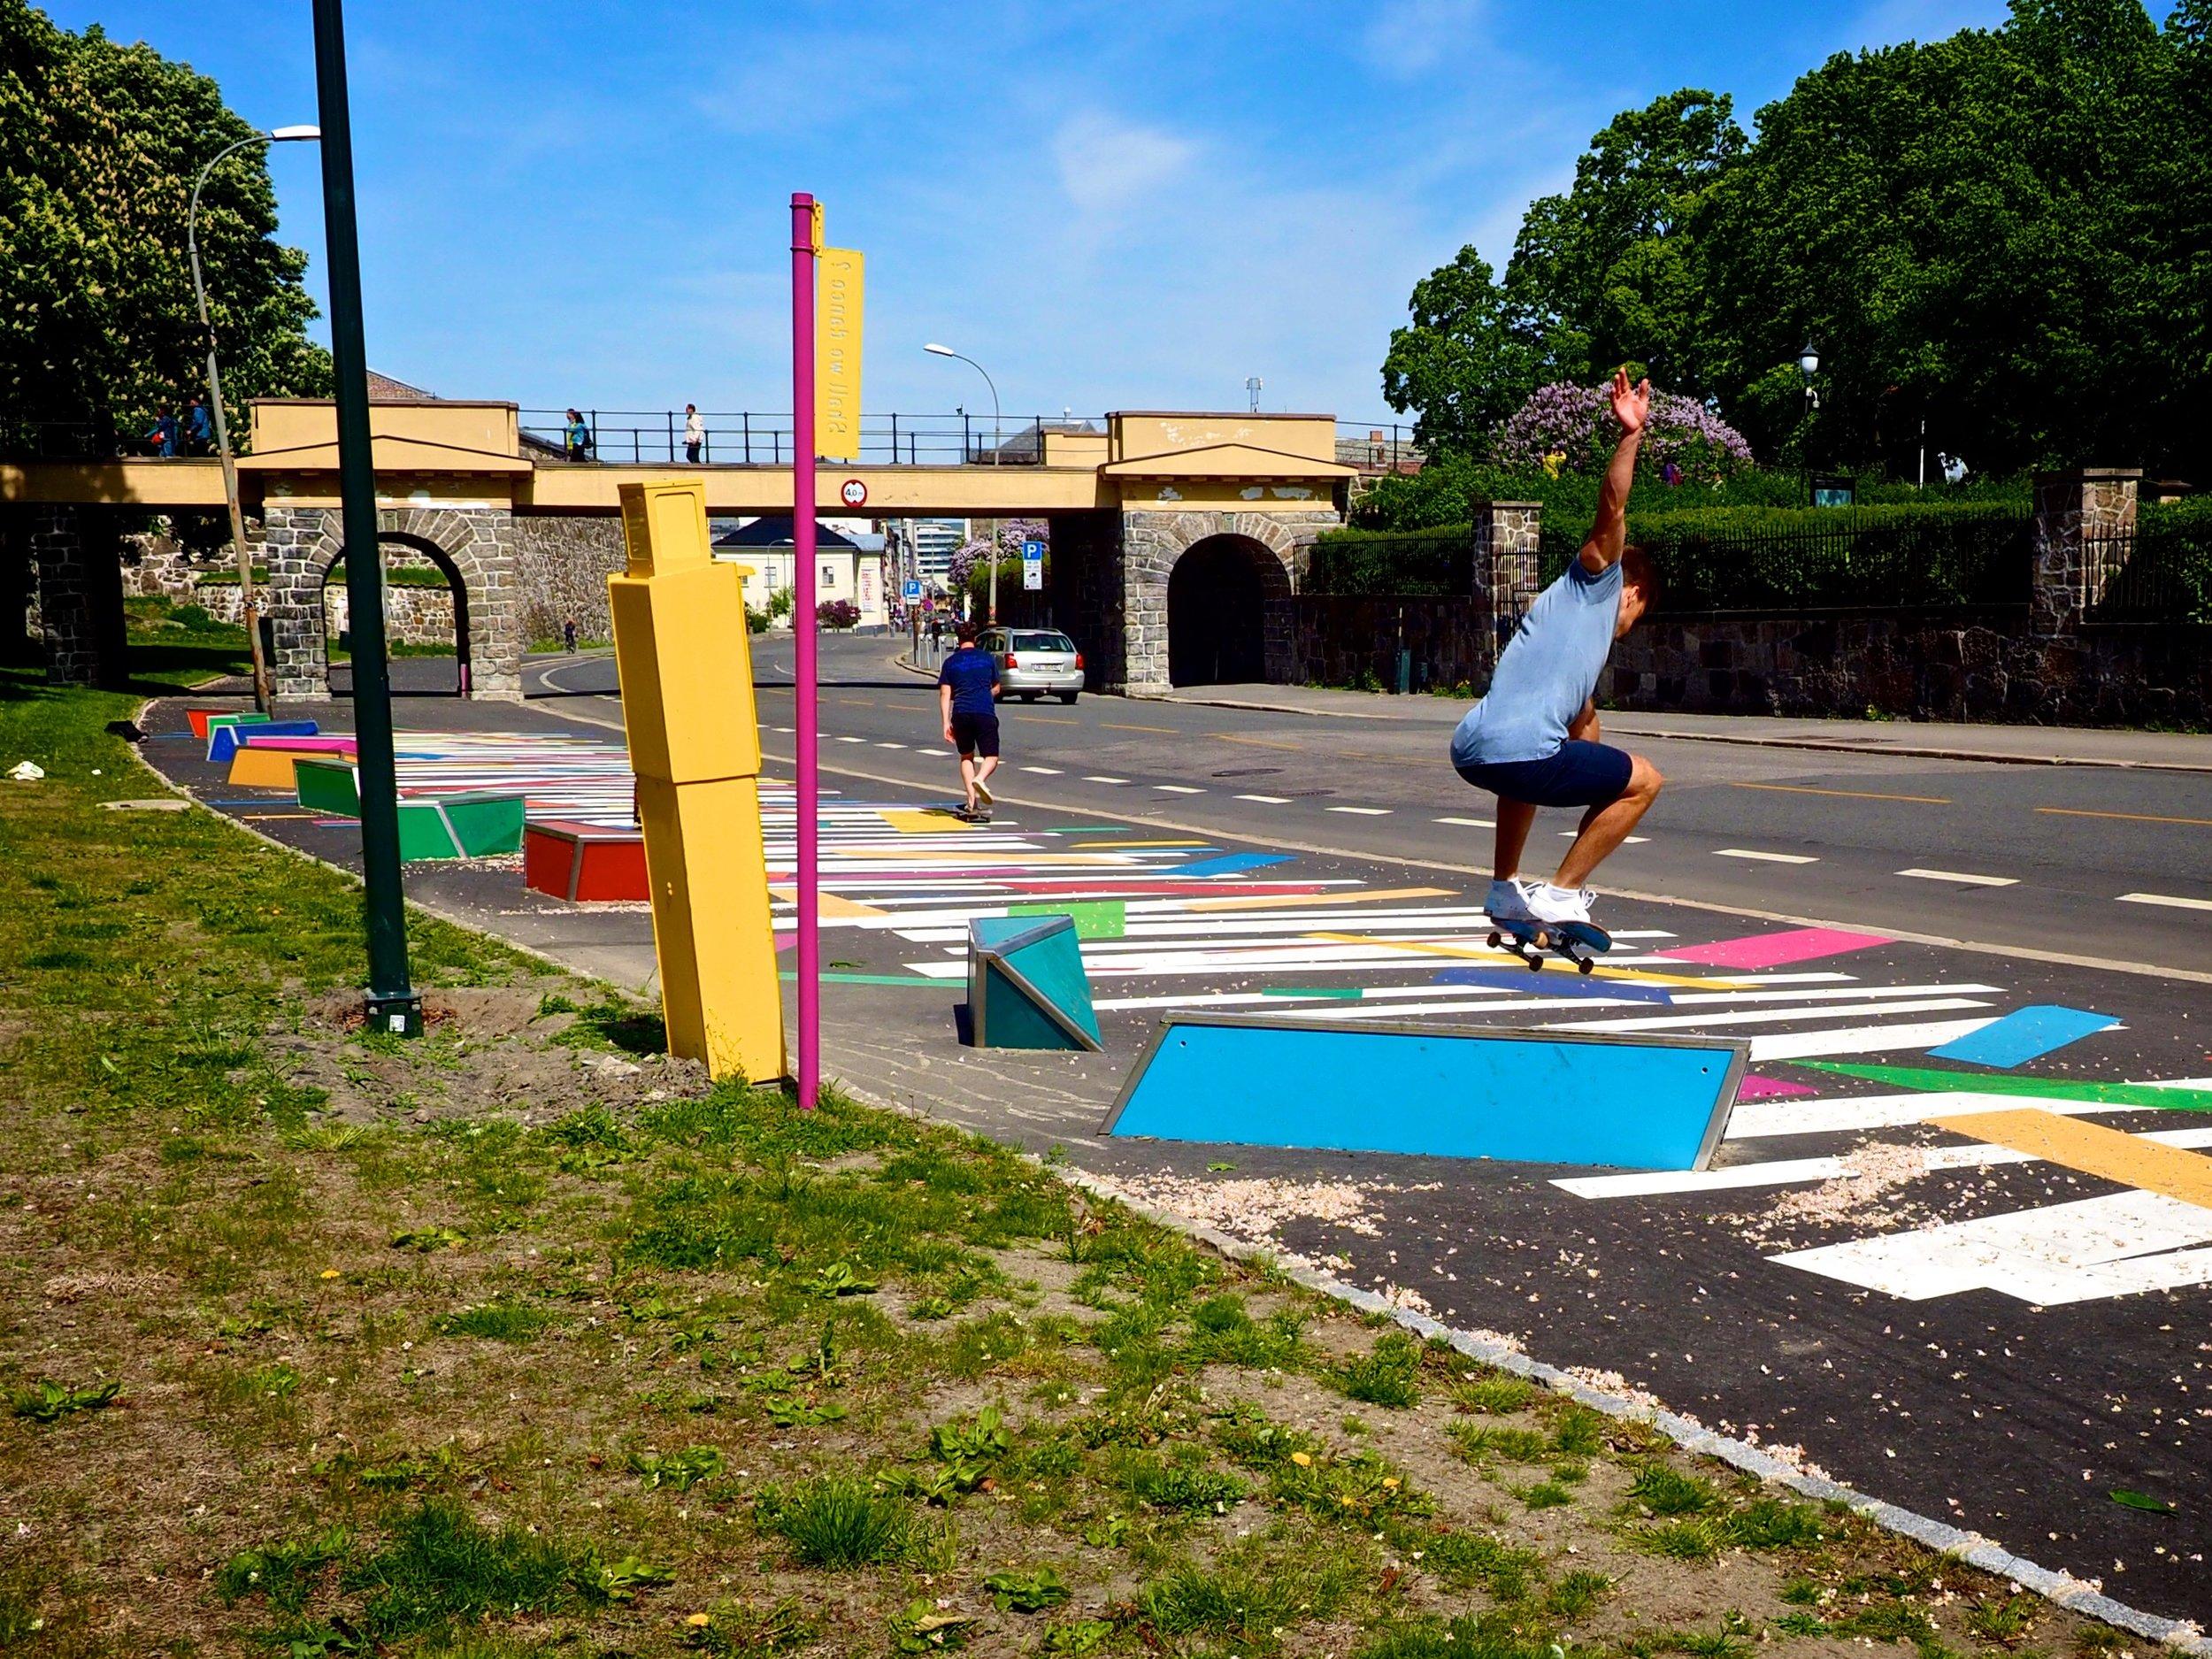 Ap-byrådet har tidligere kjøpt denne gatekunsten til 100.000 kroner. Den skal fjernes til våren.